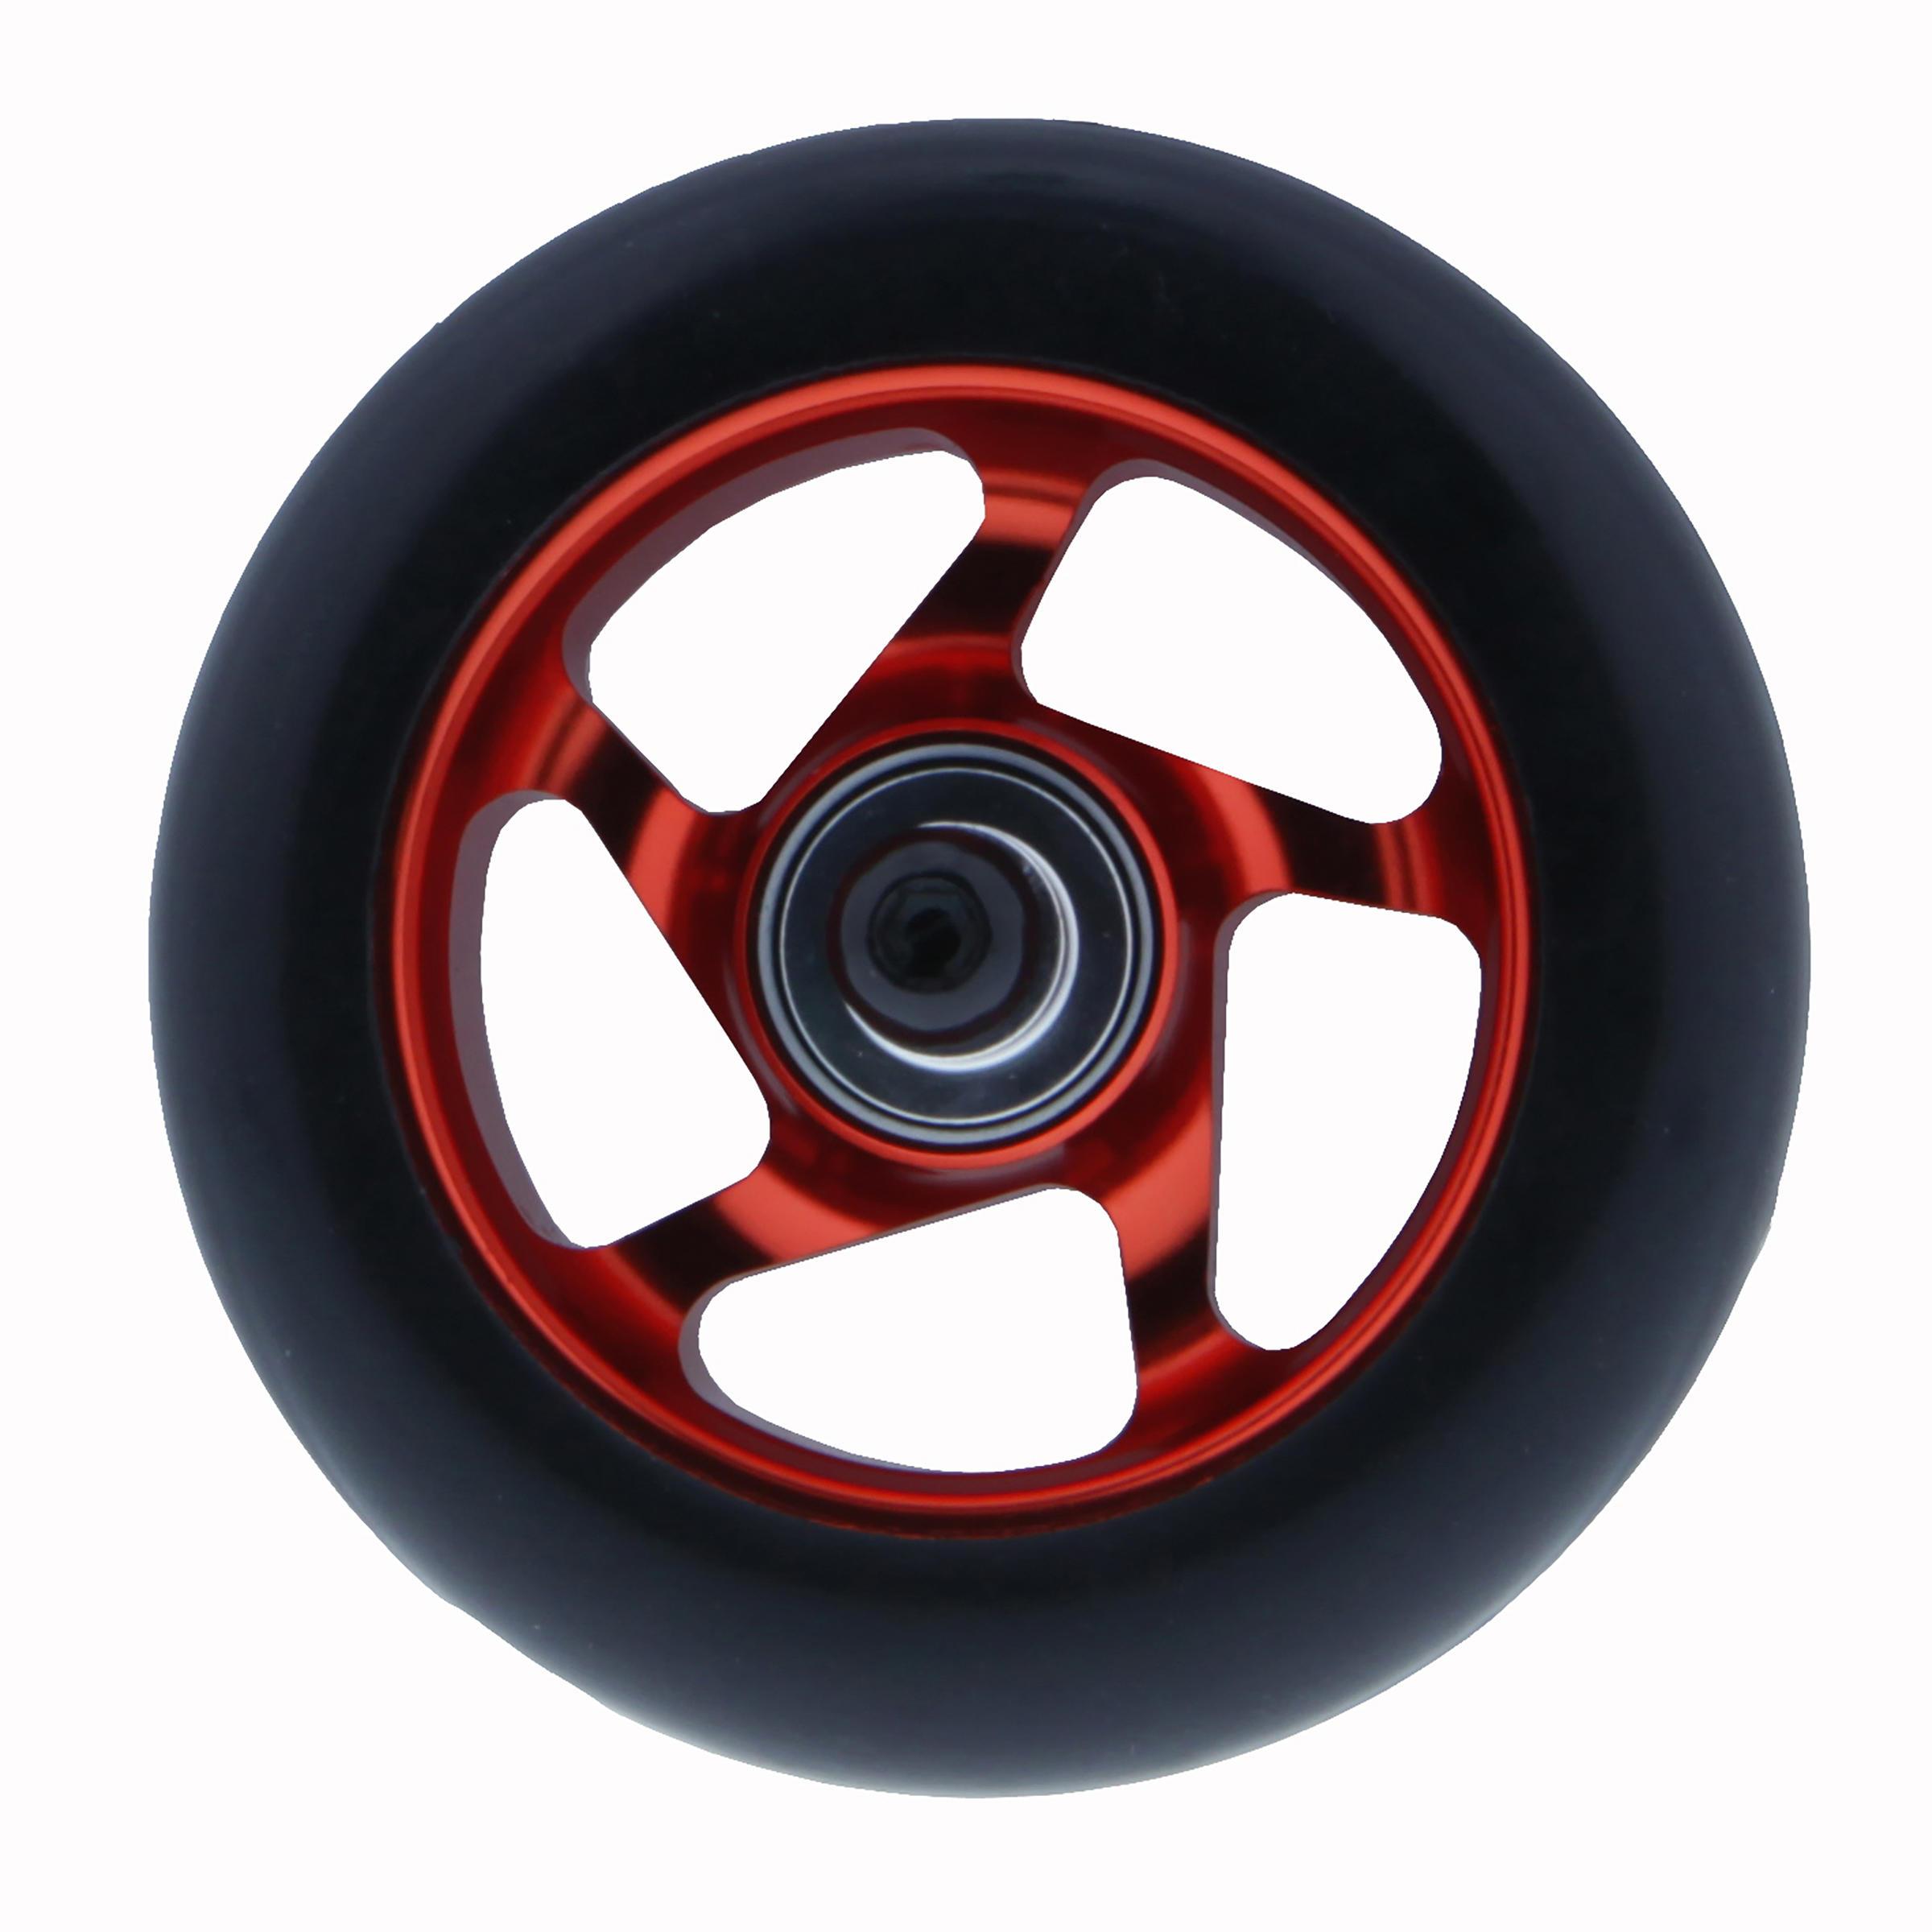 Roţi roller XC SR 500 imagine